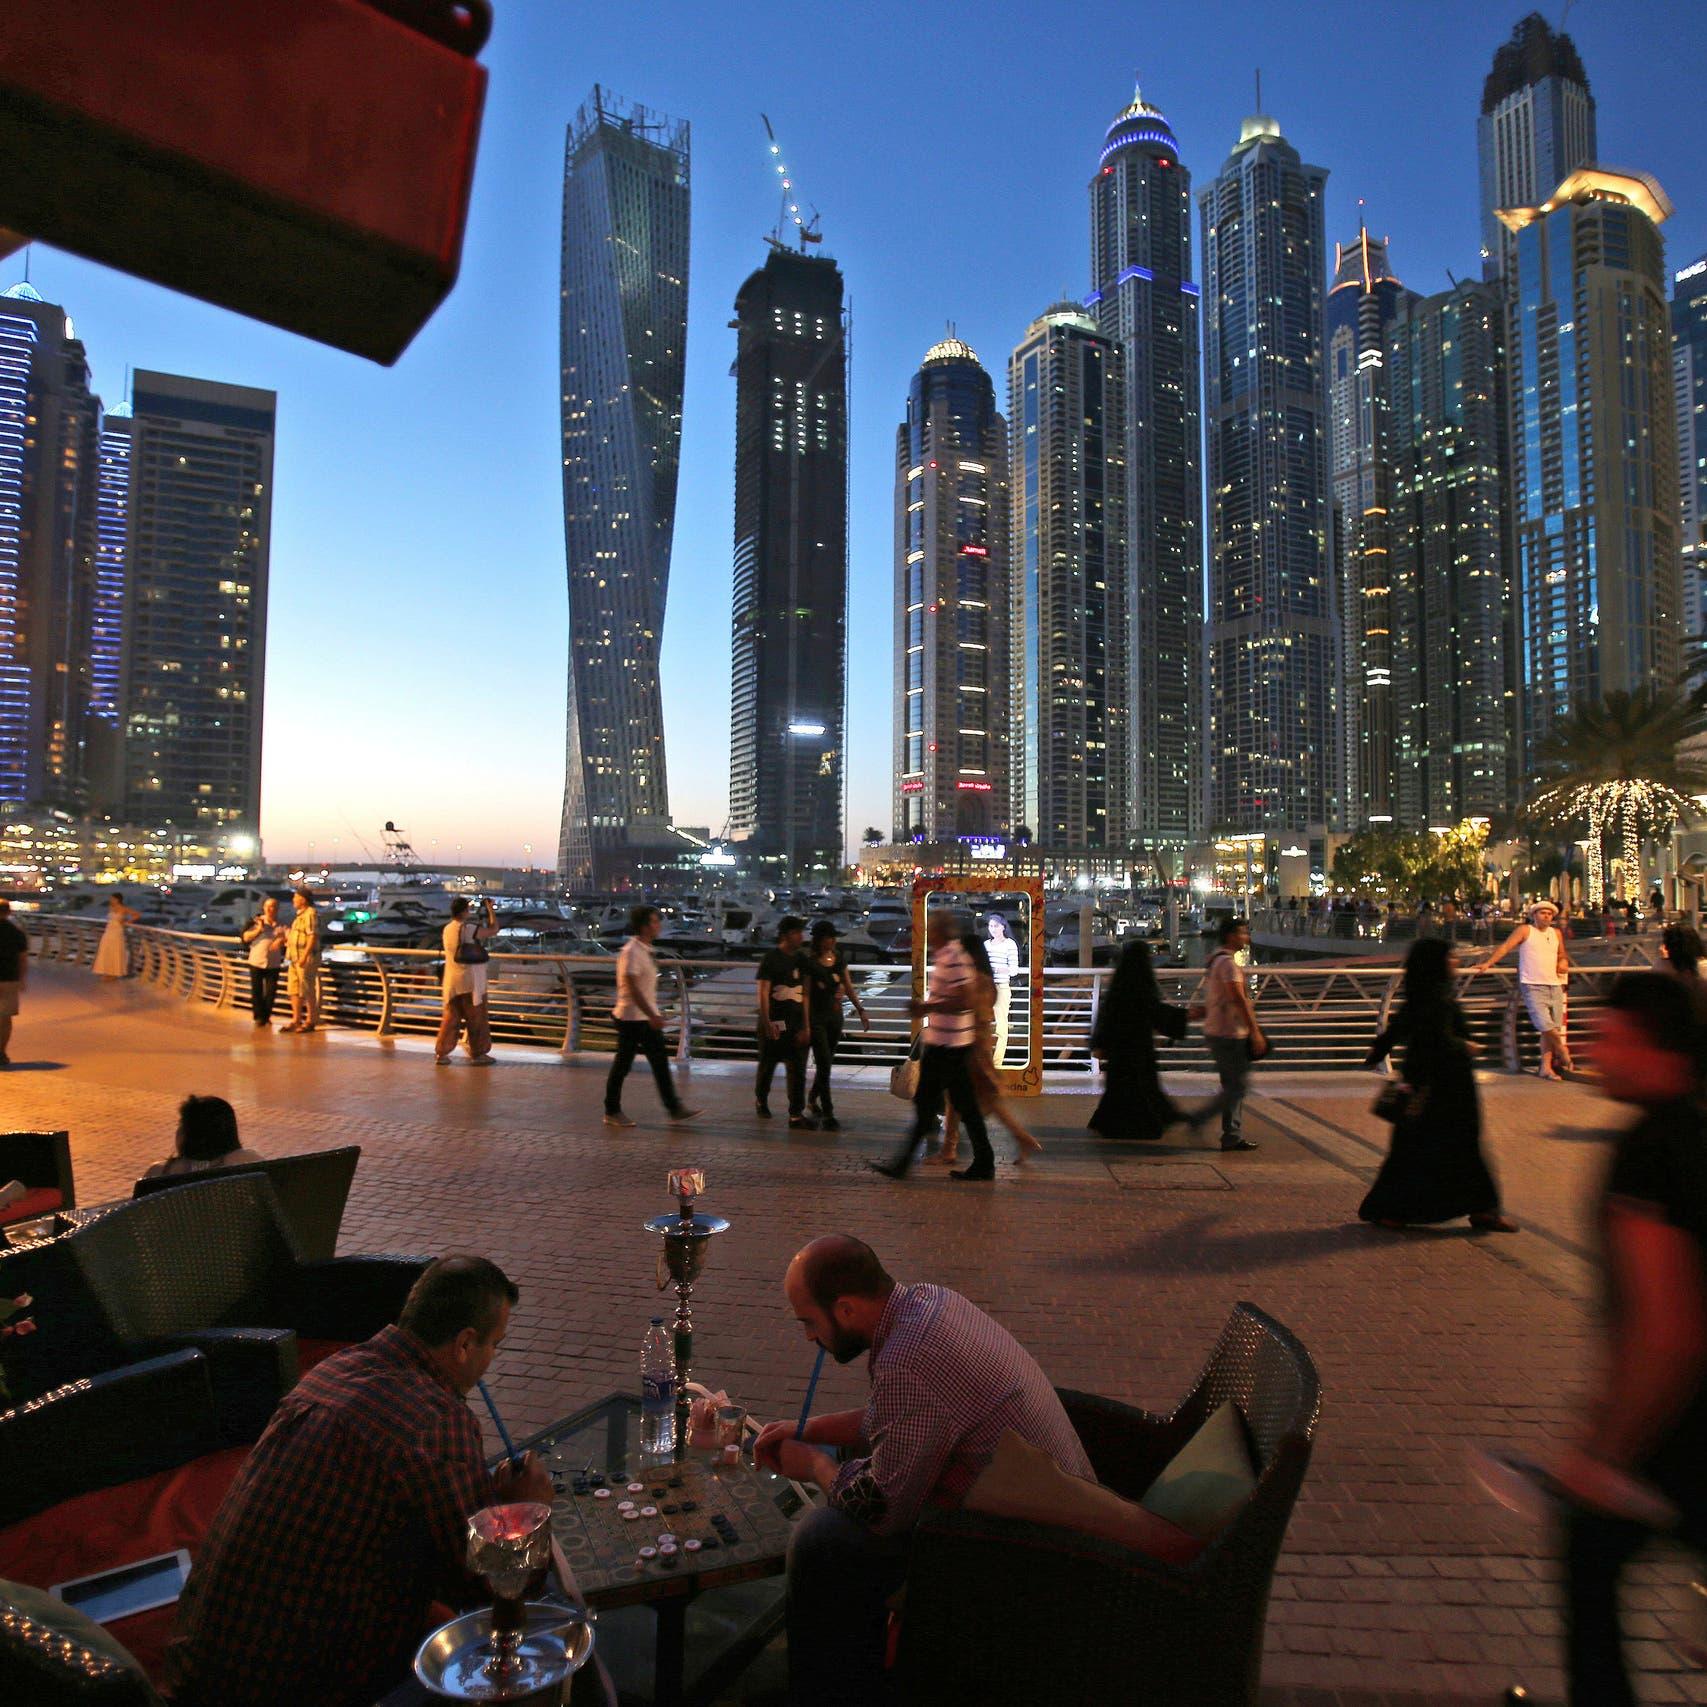 Coronavirus: Dubai suspends live entertainment permits as COVID-19 cases surge